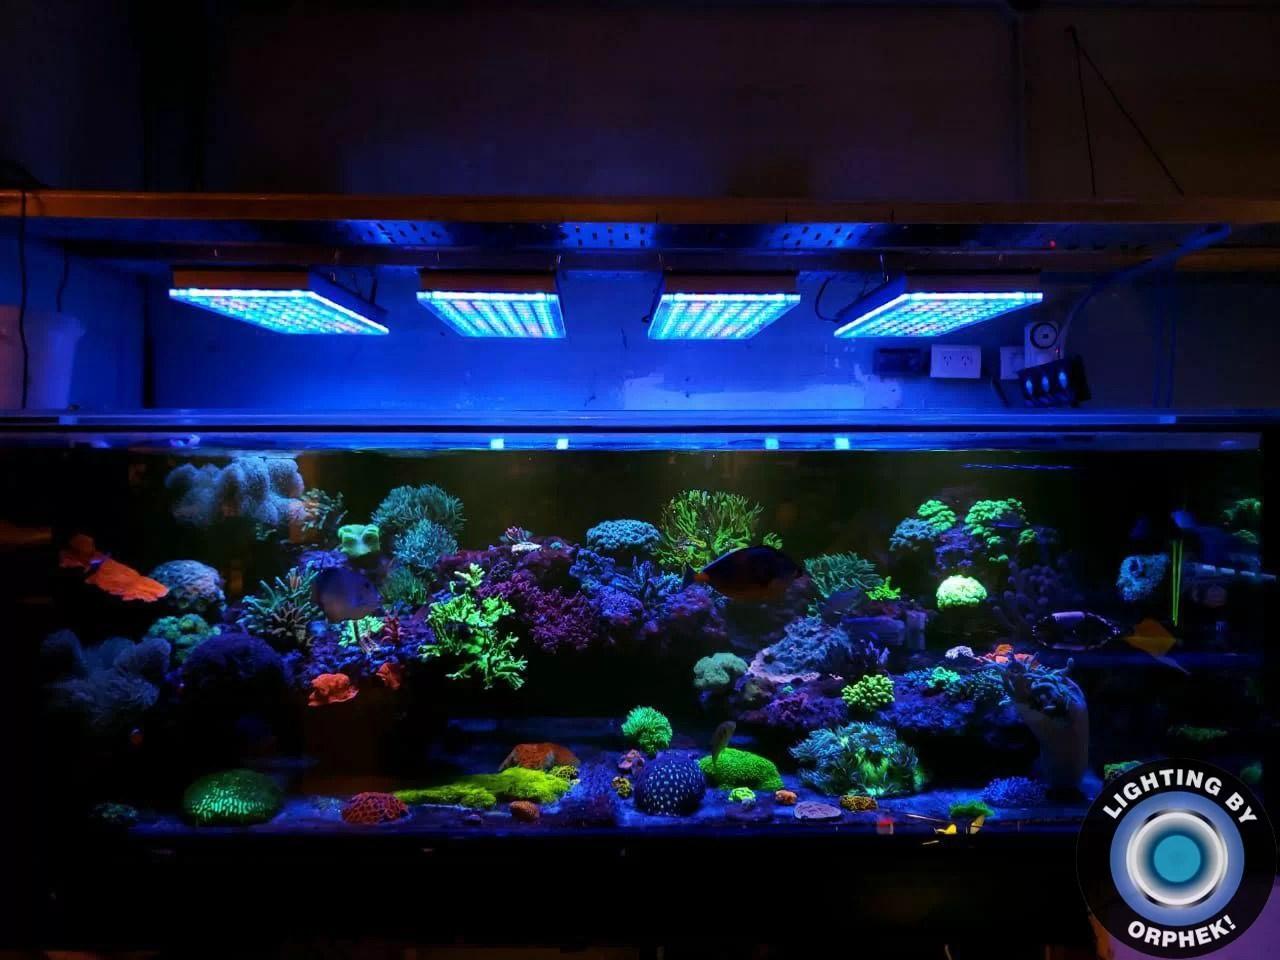 Led Beleuchtung Fur Offentliche Aquarium Orphek